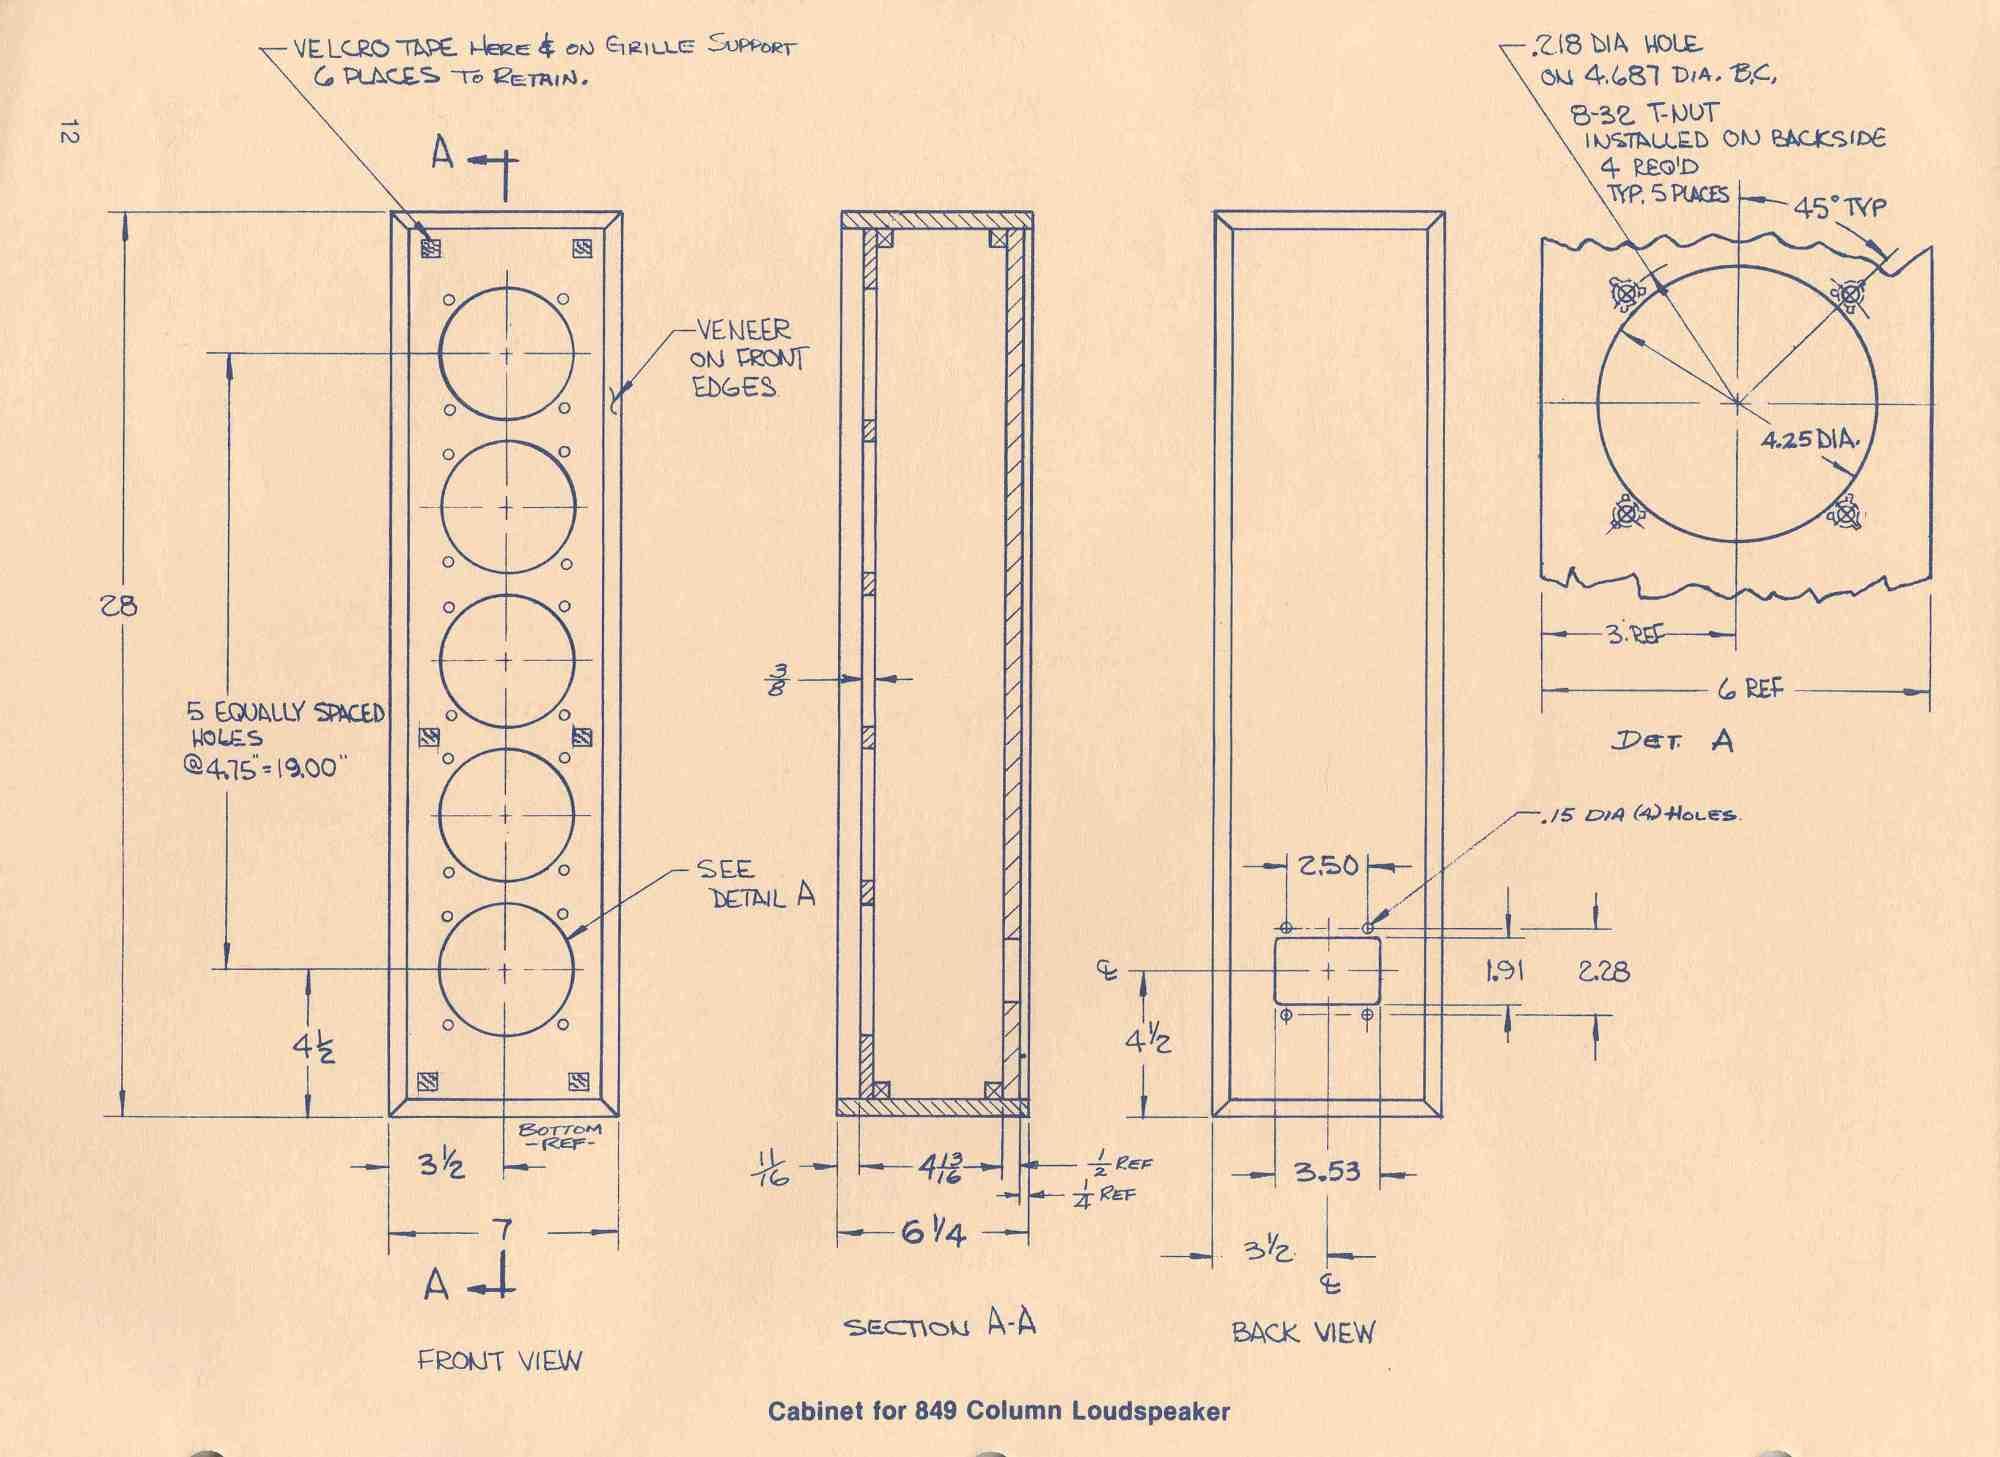 hight resolution of loudspeaker schematic diagram and cabinet design plan home speaker wiring diagram altec lansing cabinet for 849